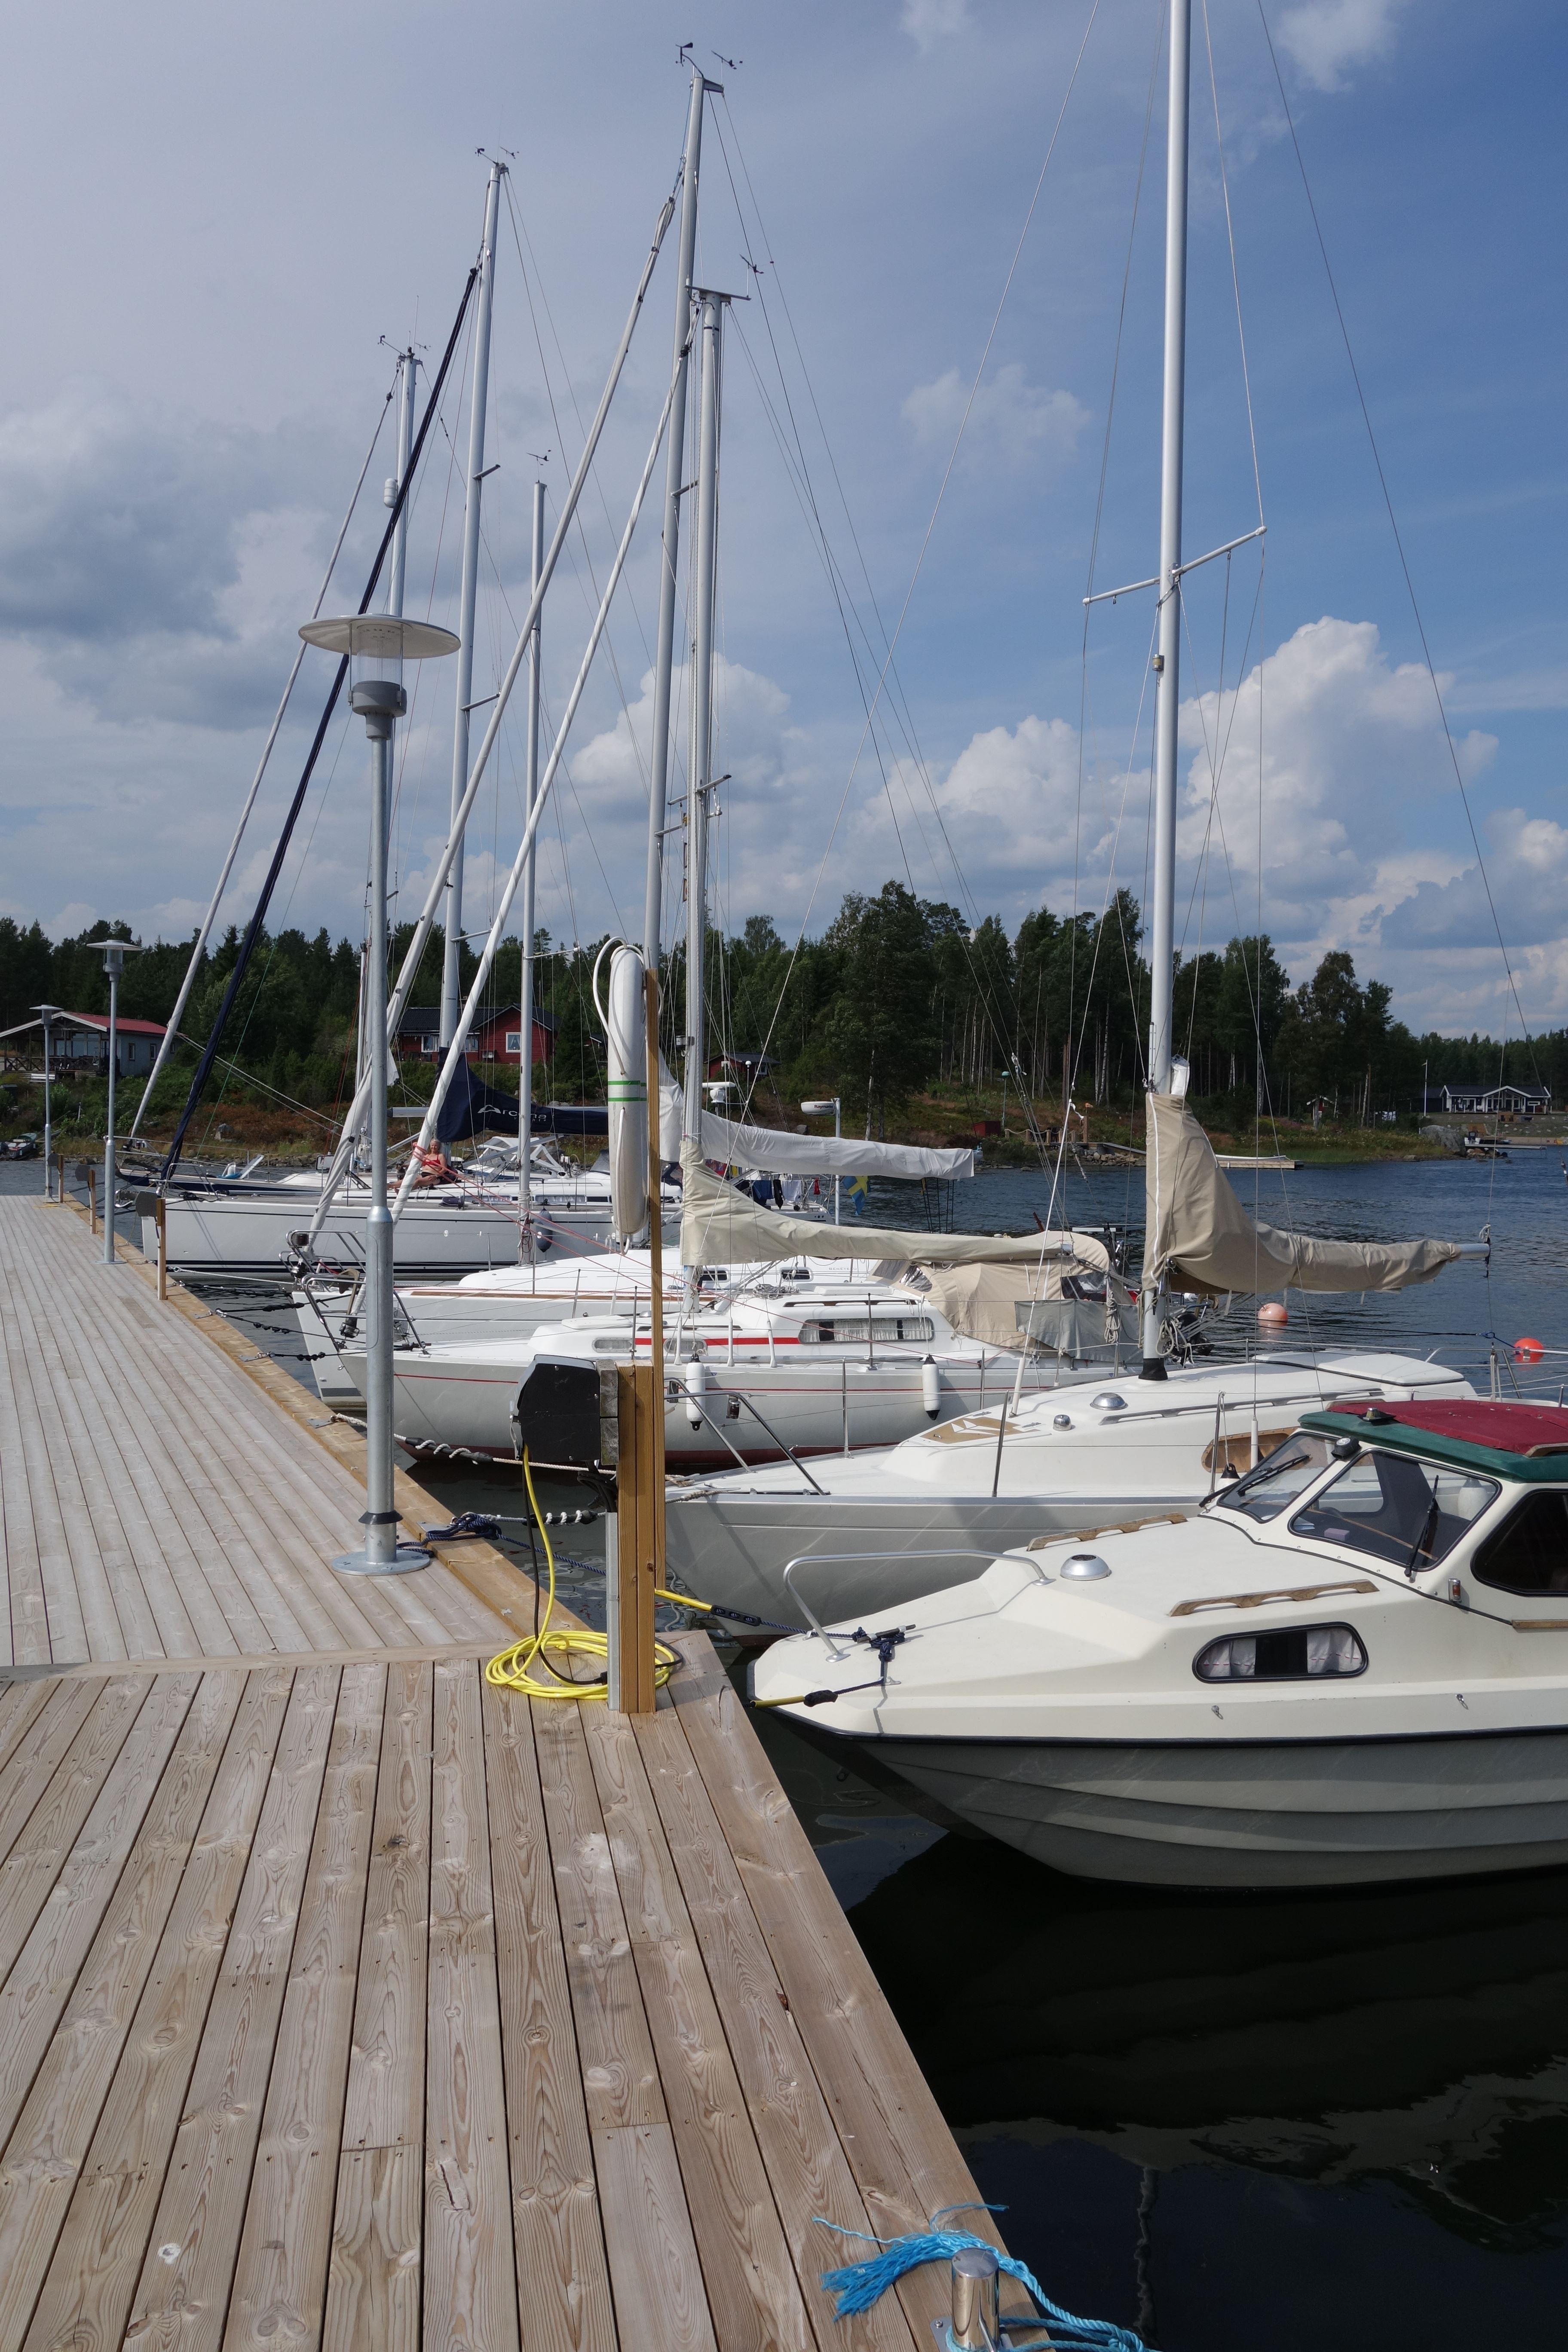 Segelviks Gästhamn